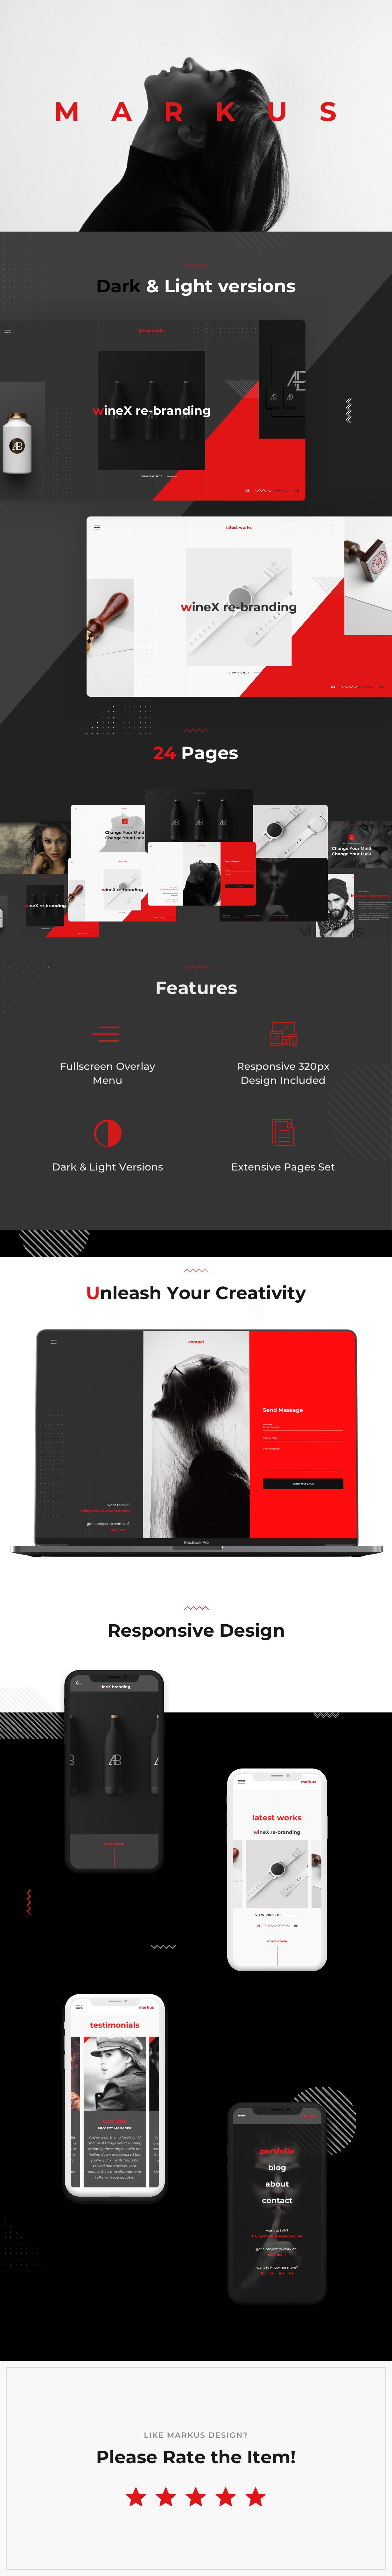 Markus – Creative Fullscreen Portfolio PSD Template - 6